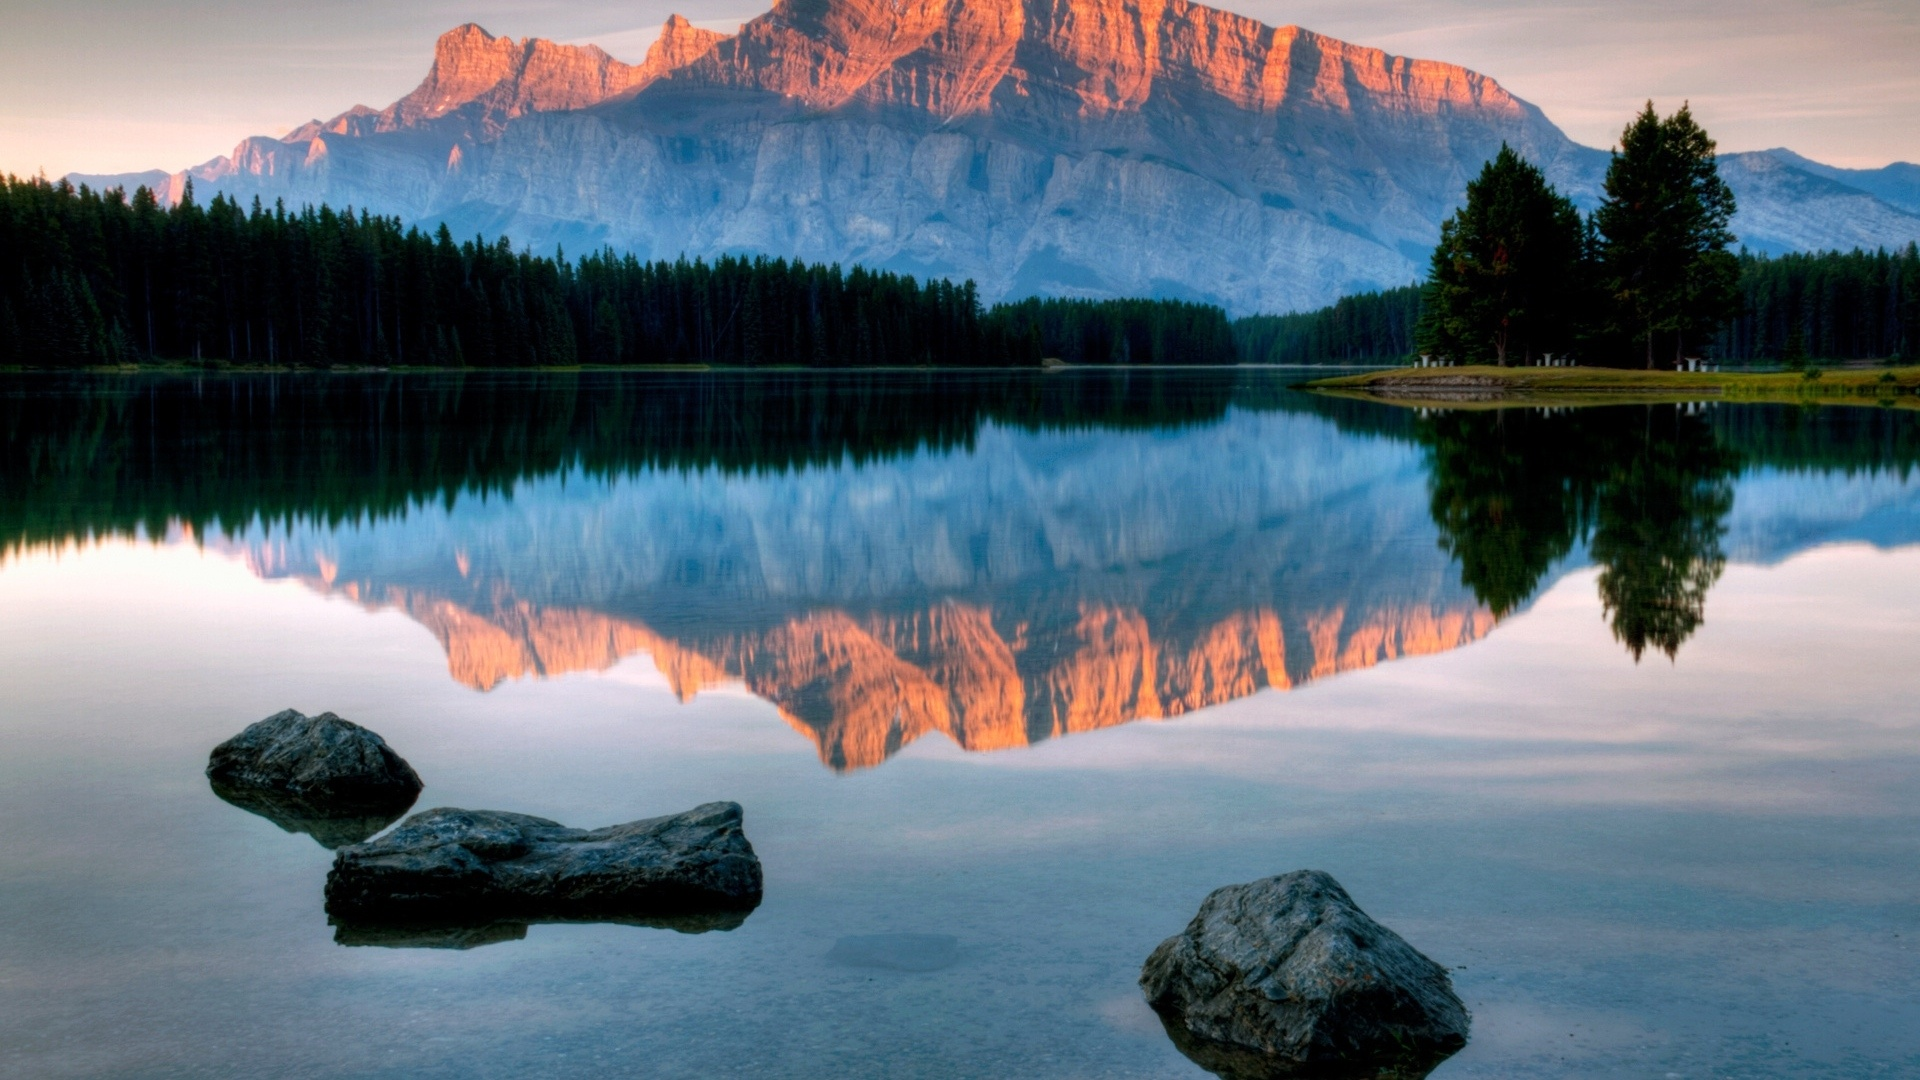 Reflection wallpaper photo hd